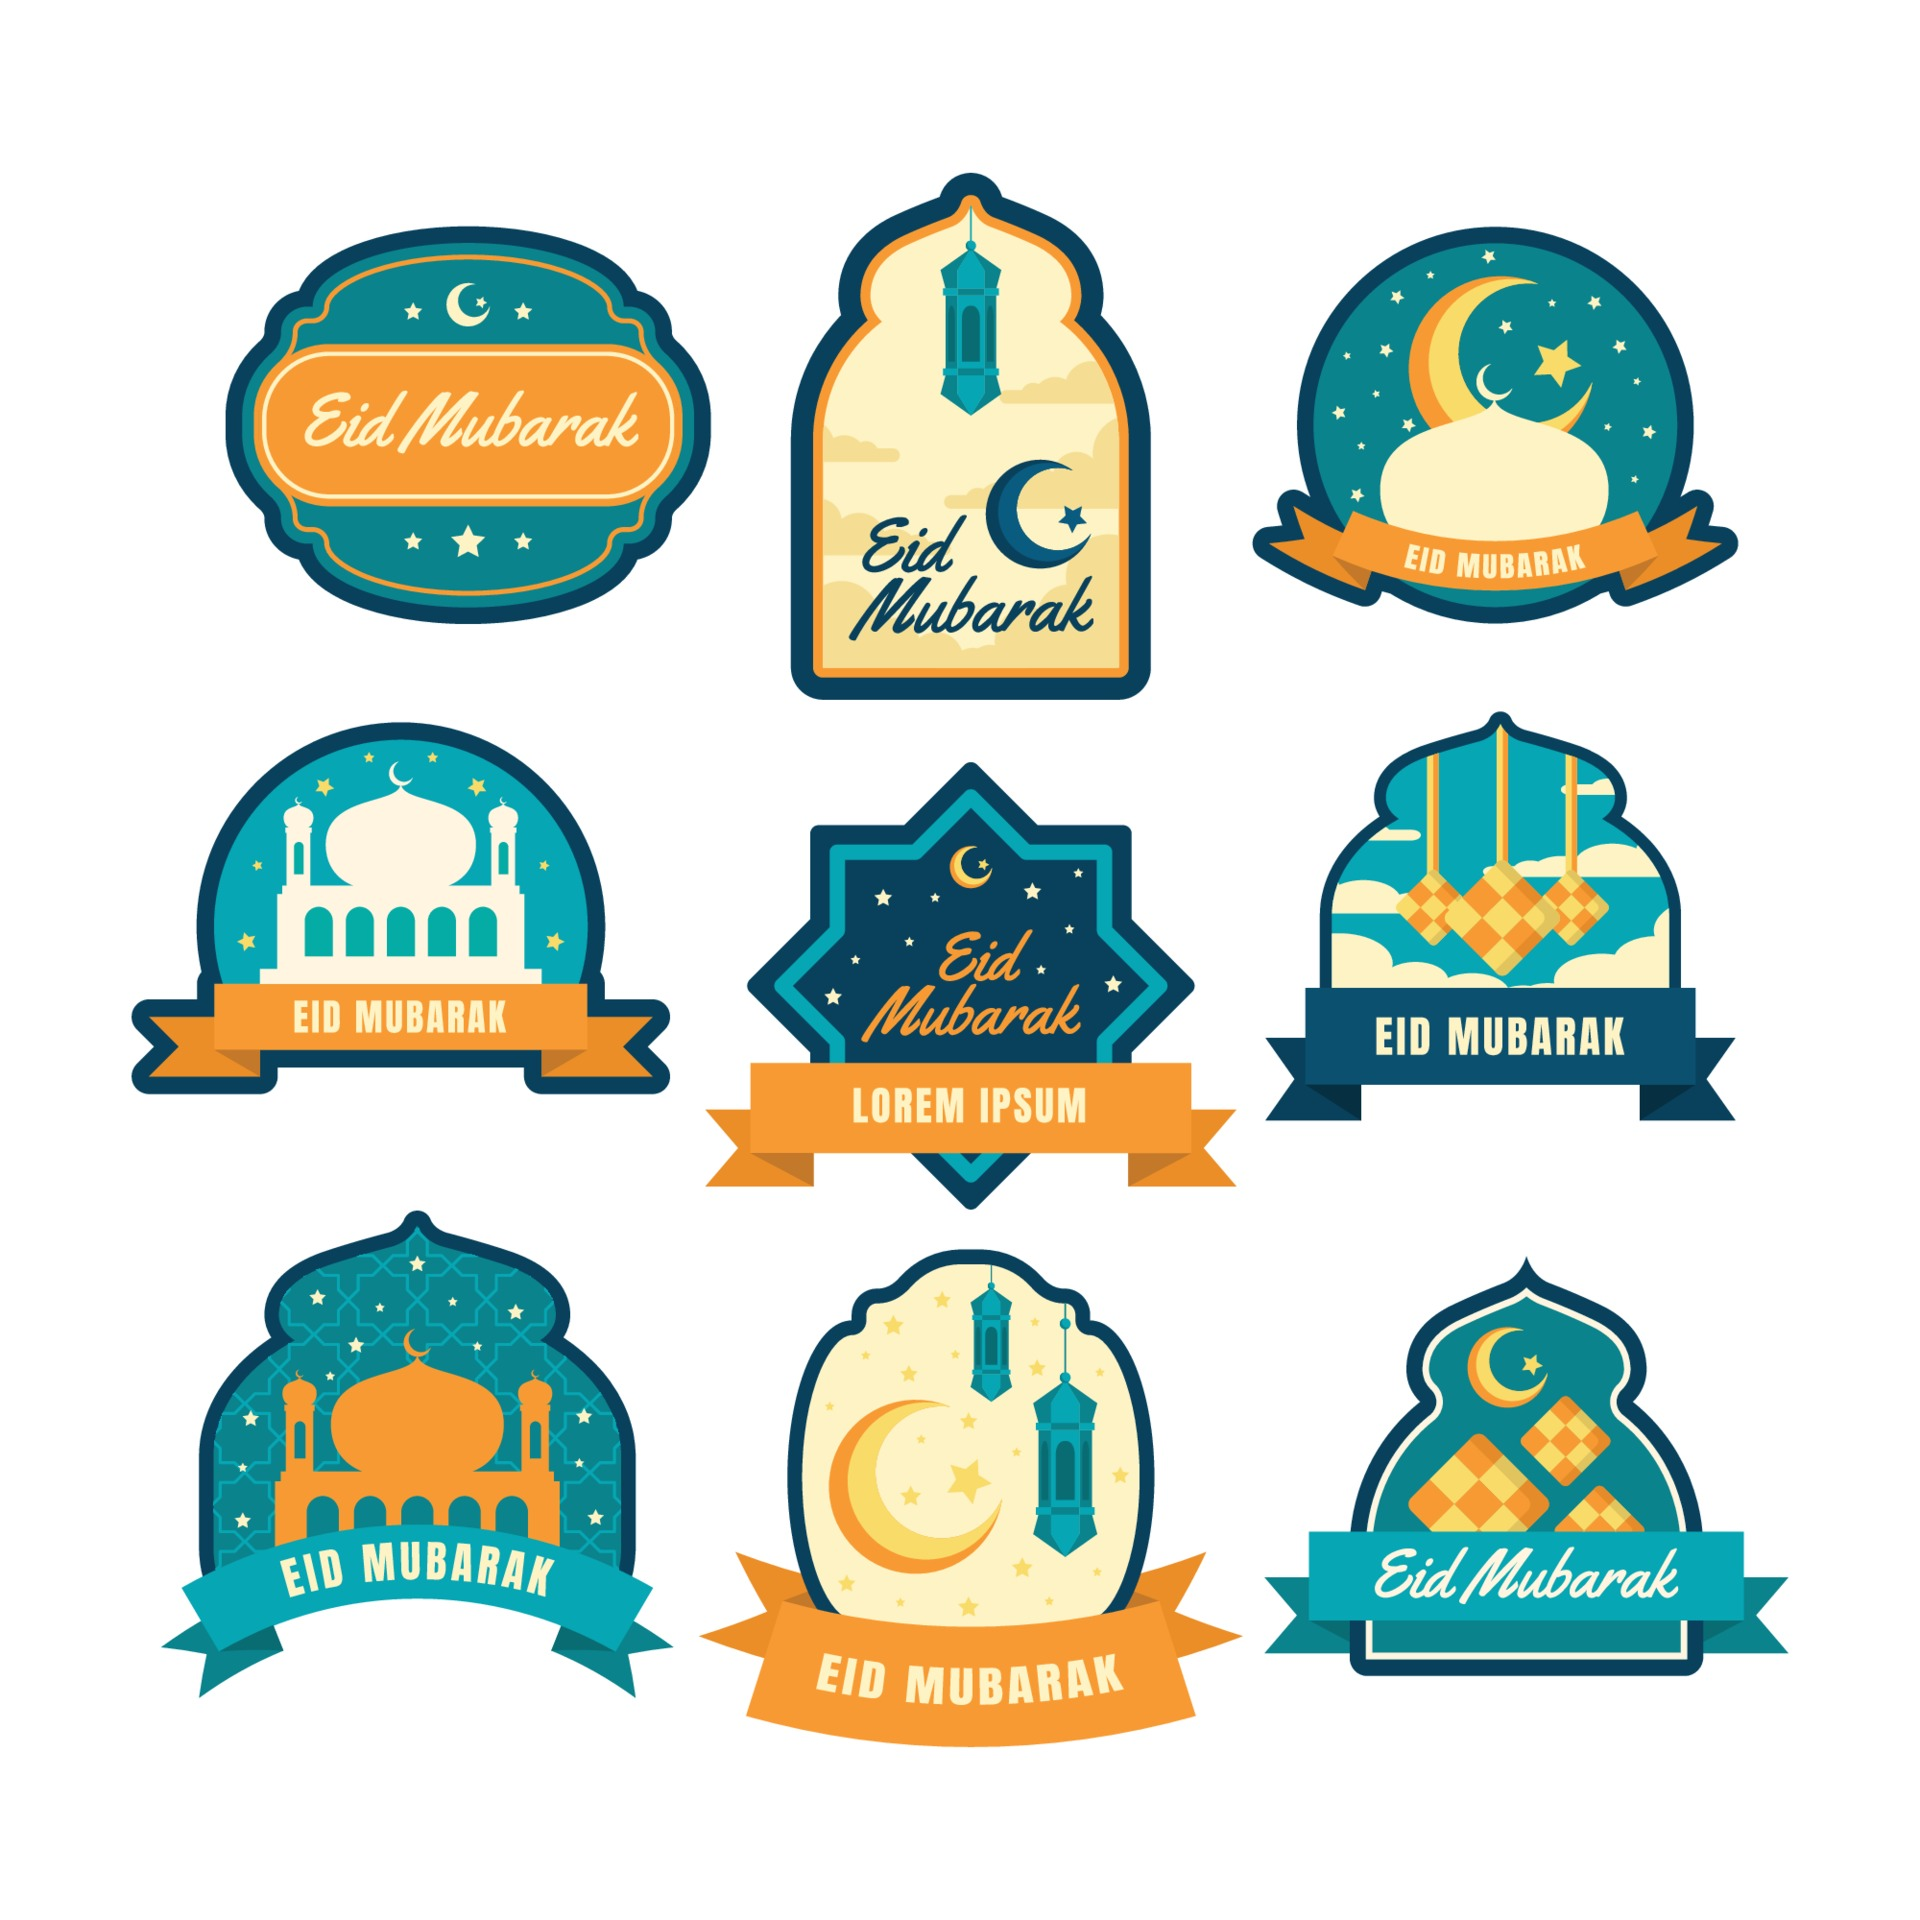 Eid Mubarak Label Set 2072277 Vector Art At Vecteezy